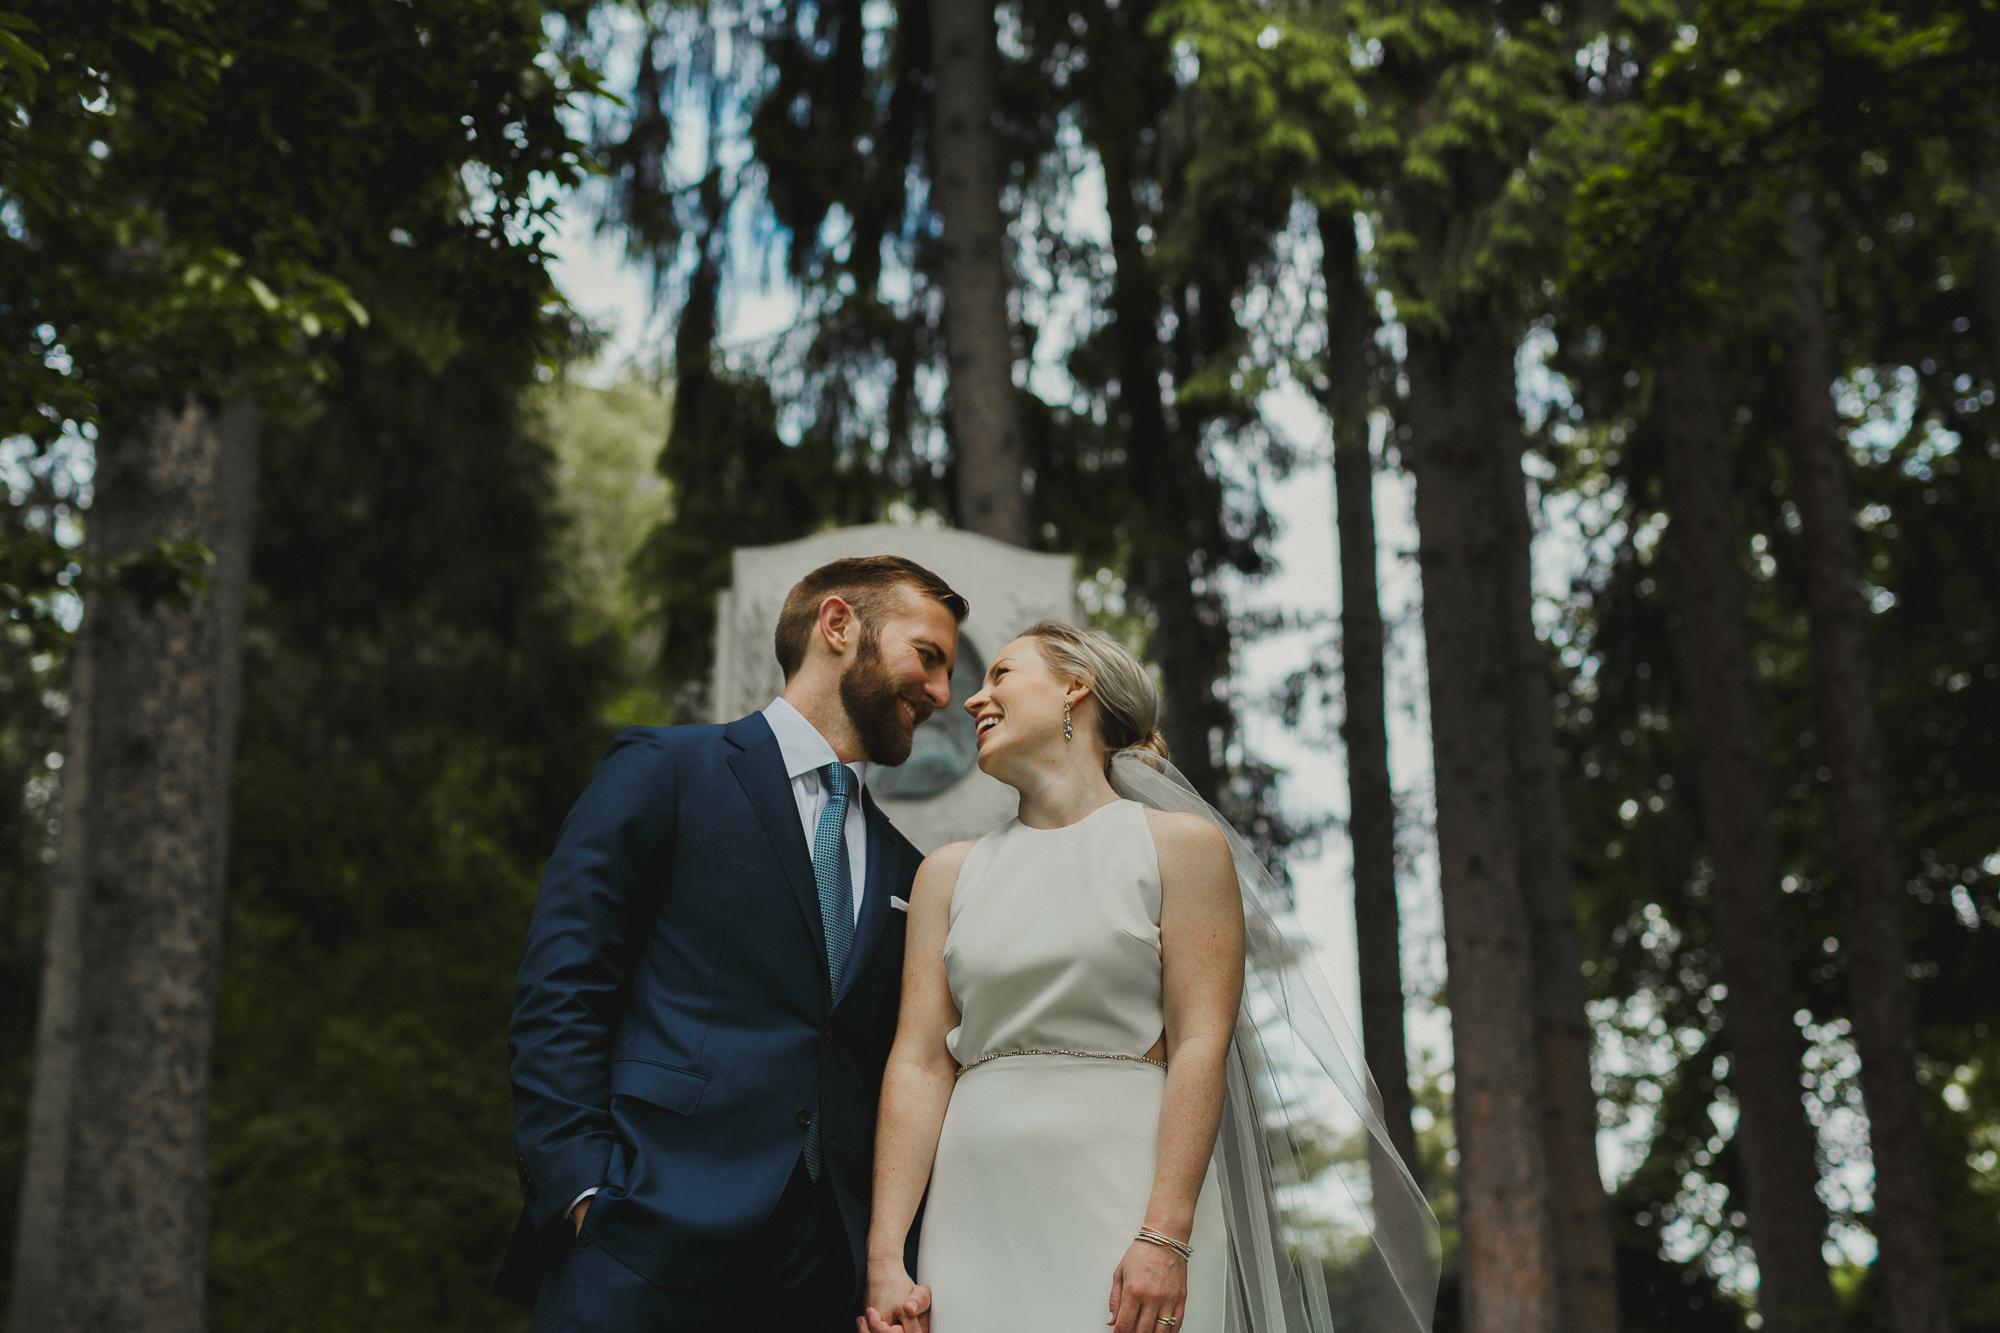 canlis restaurant wedding photos by Krista Welch-0022.jpg